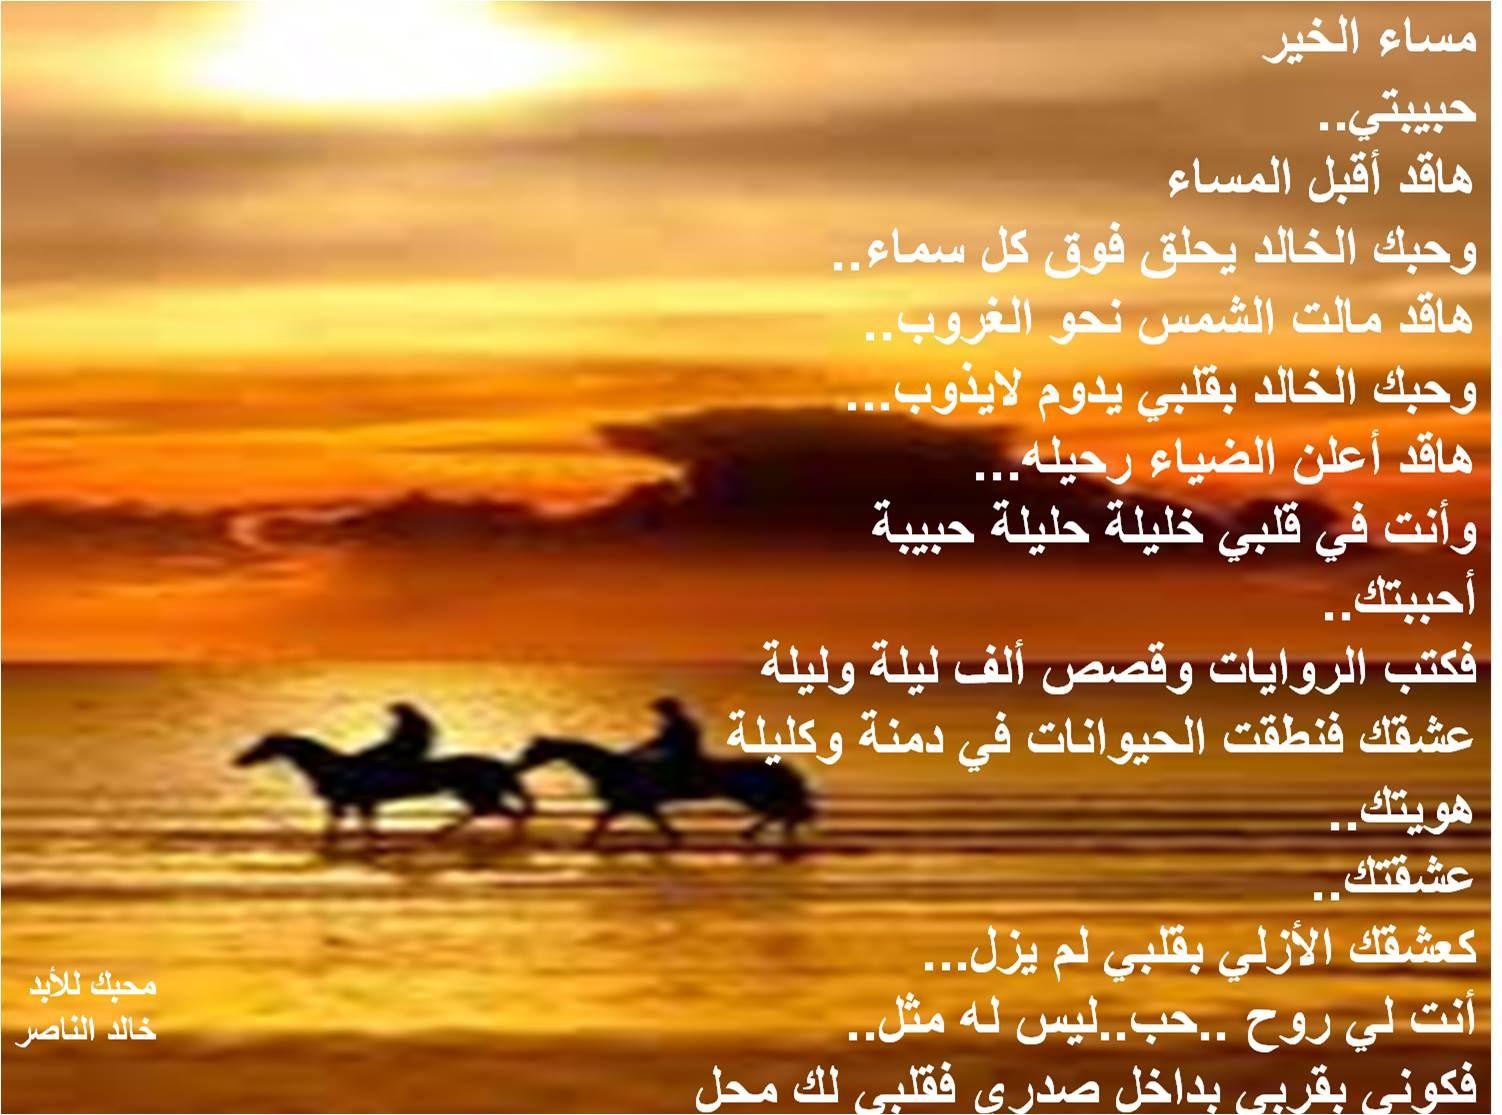 Pin By خالد الناصر آل درين On قصائد عشق بقلم خالد الناصر ال درين Movie Posters Poster Movies